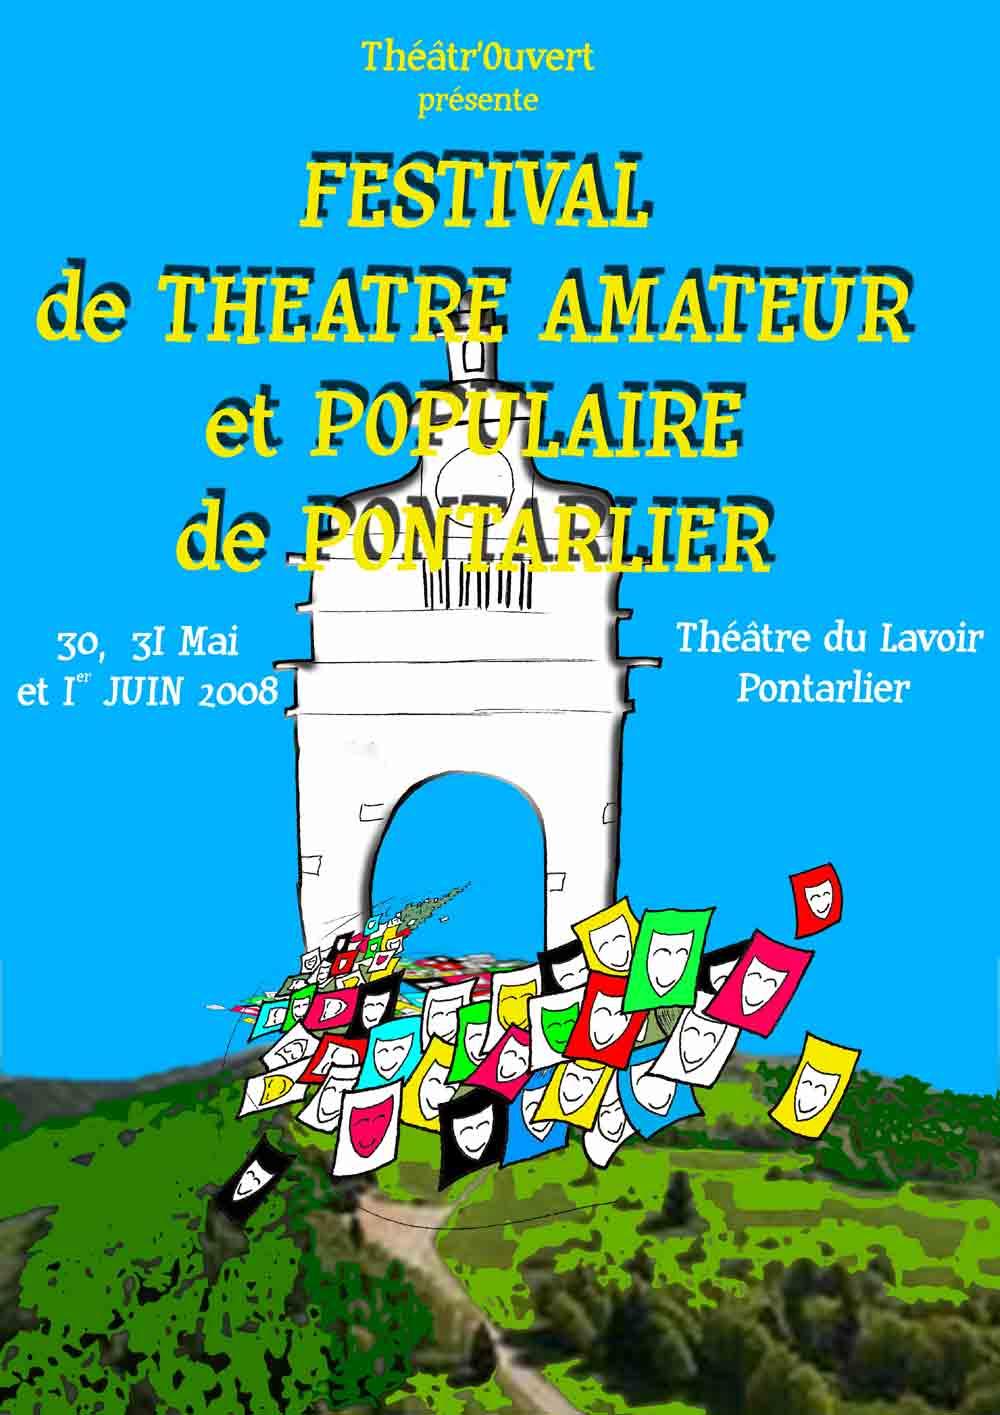 theatreouvert2.jpg - 83.92 Ko